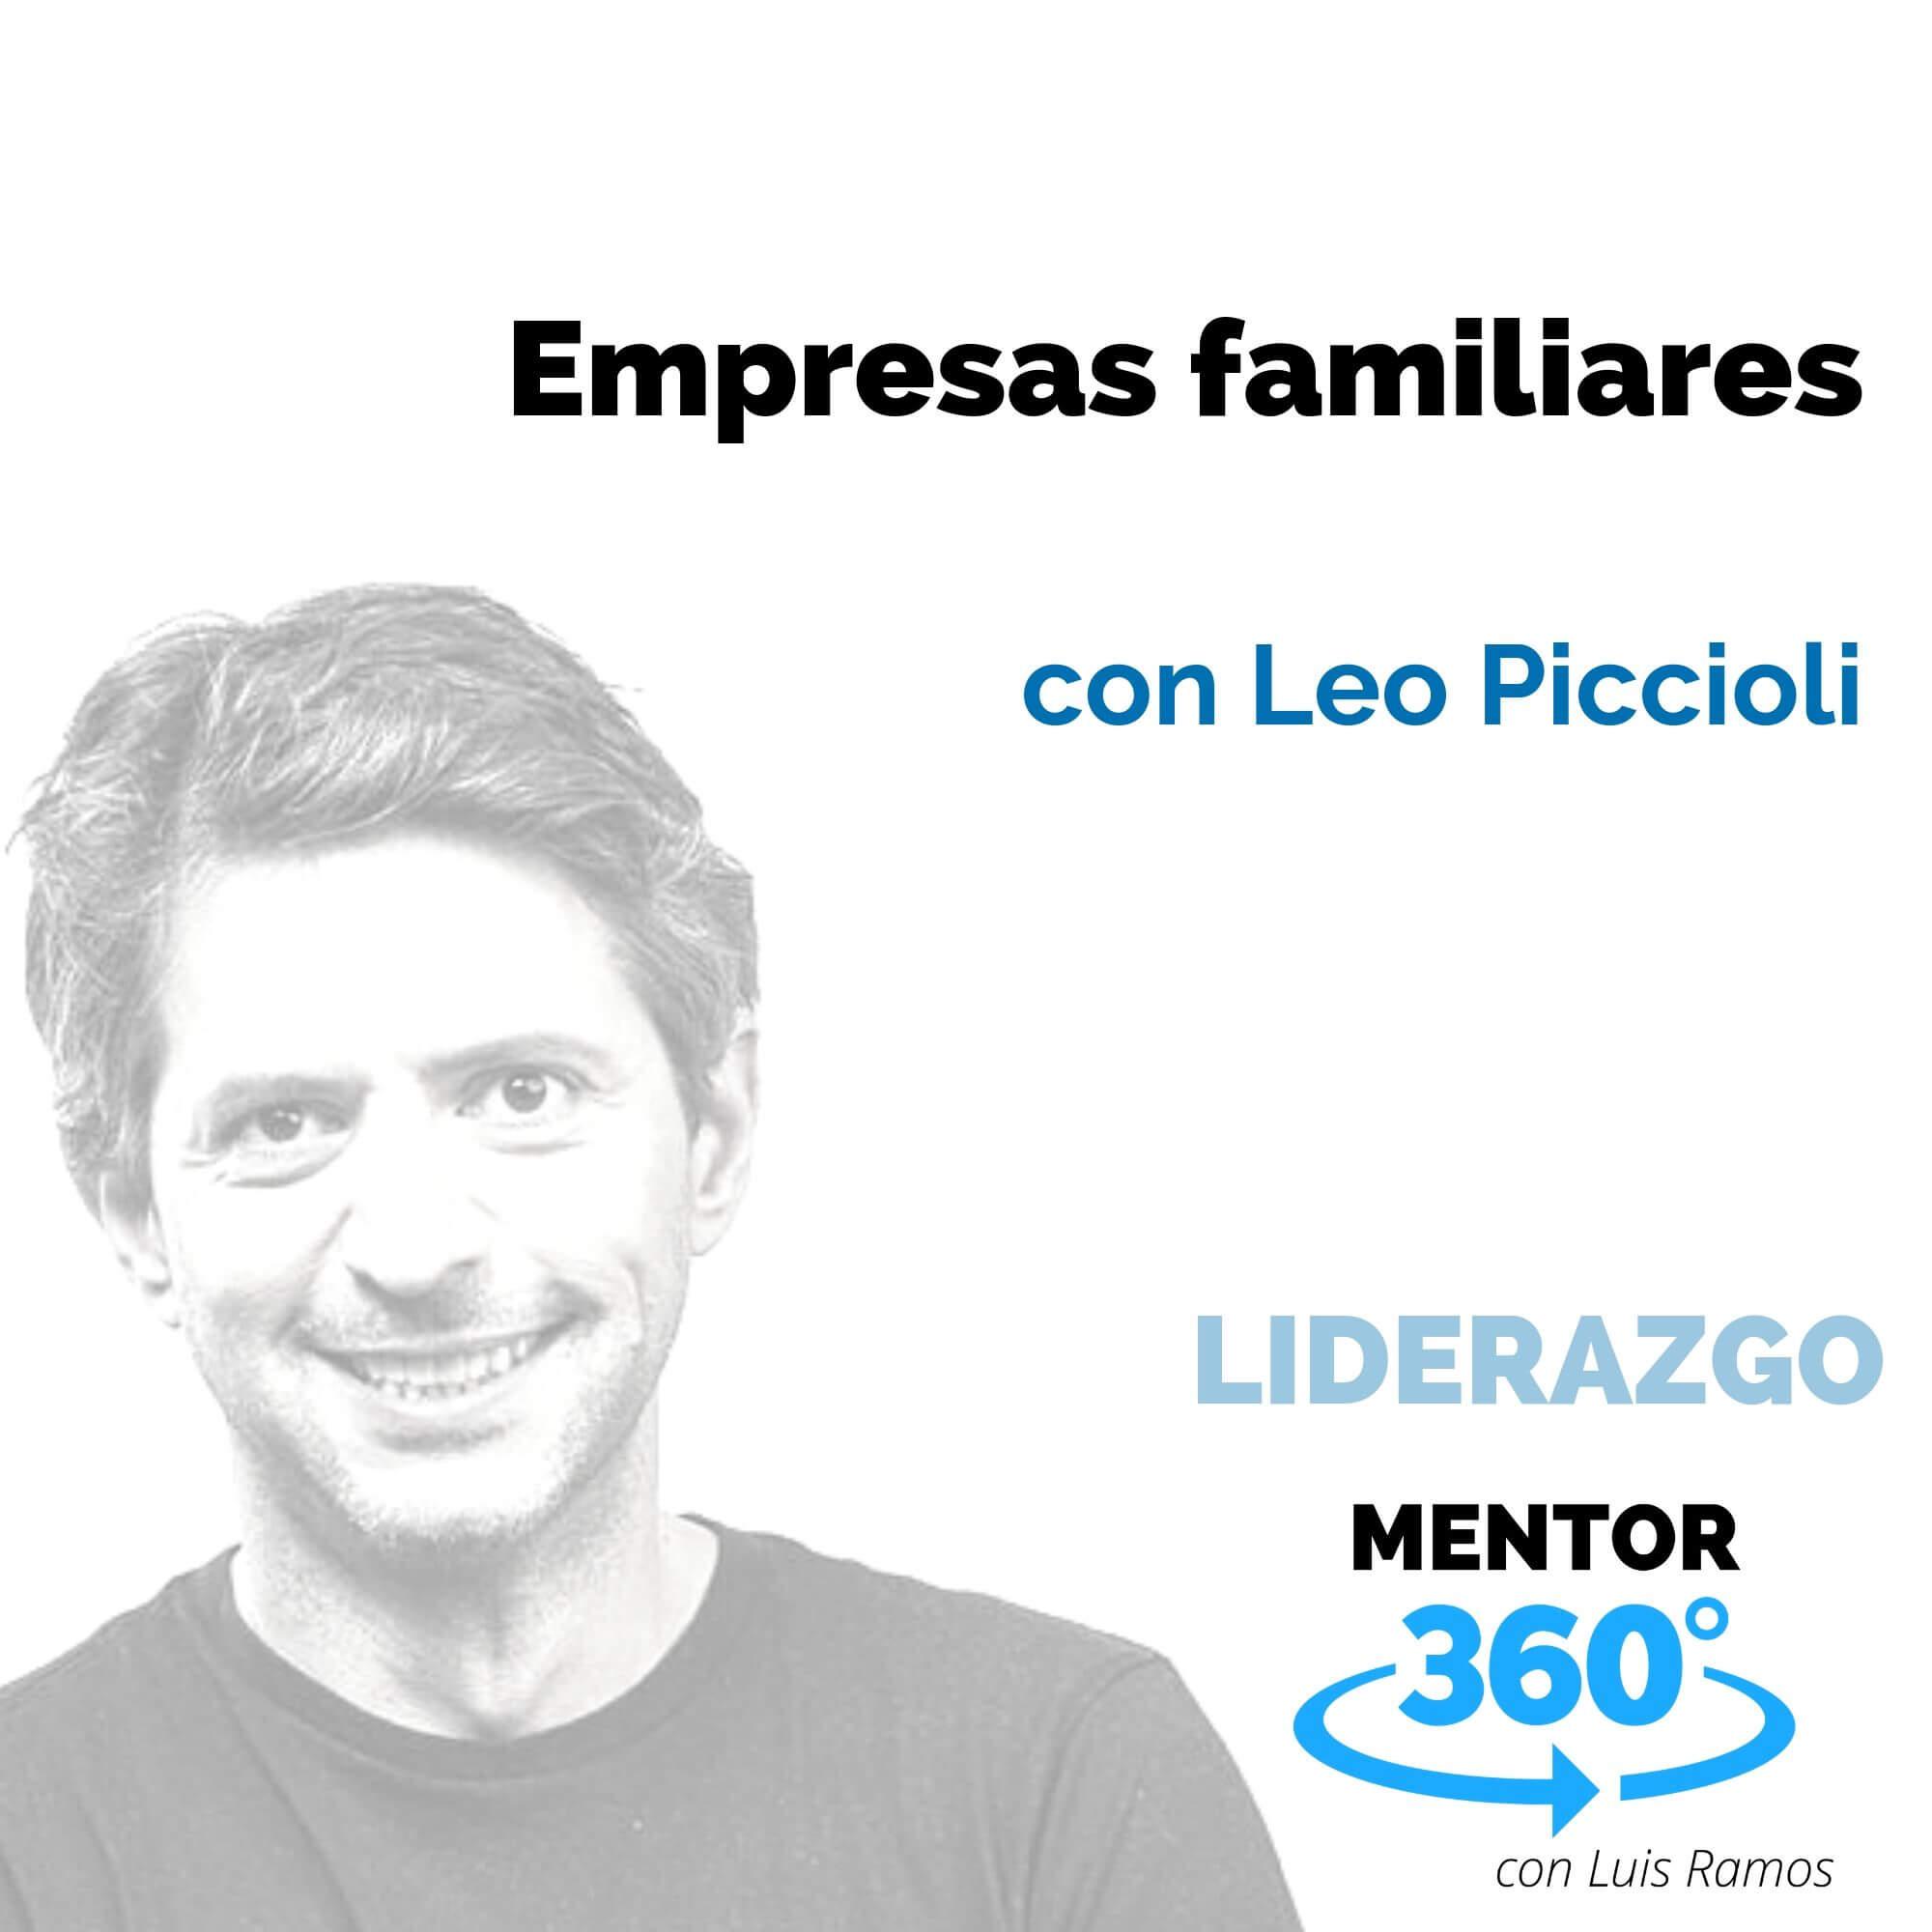 Empresas familiares, con Leo Piccioli - LIDERAZGO